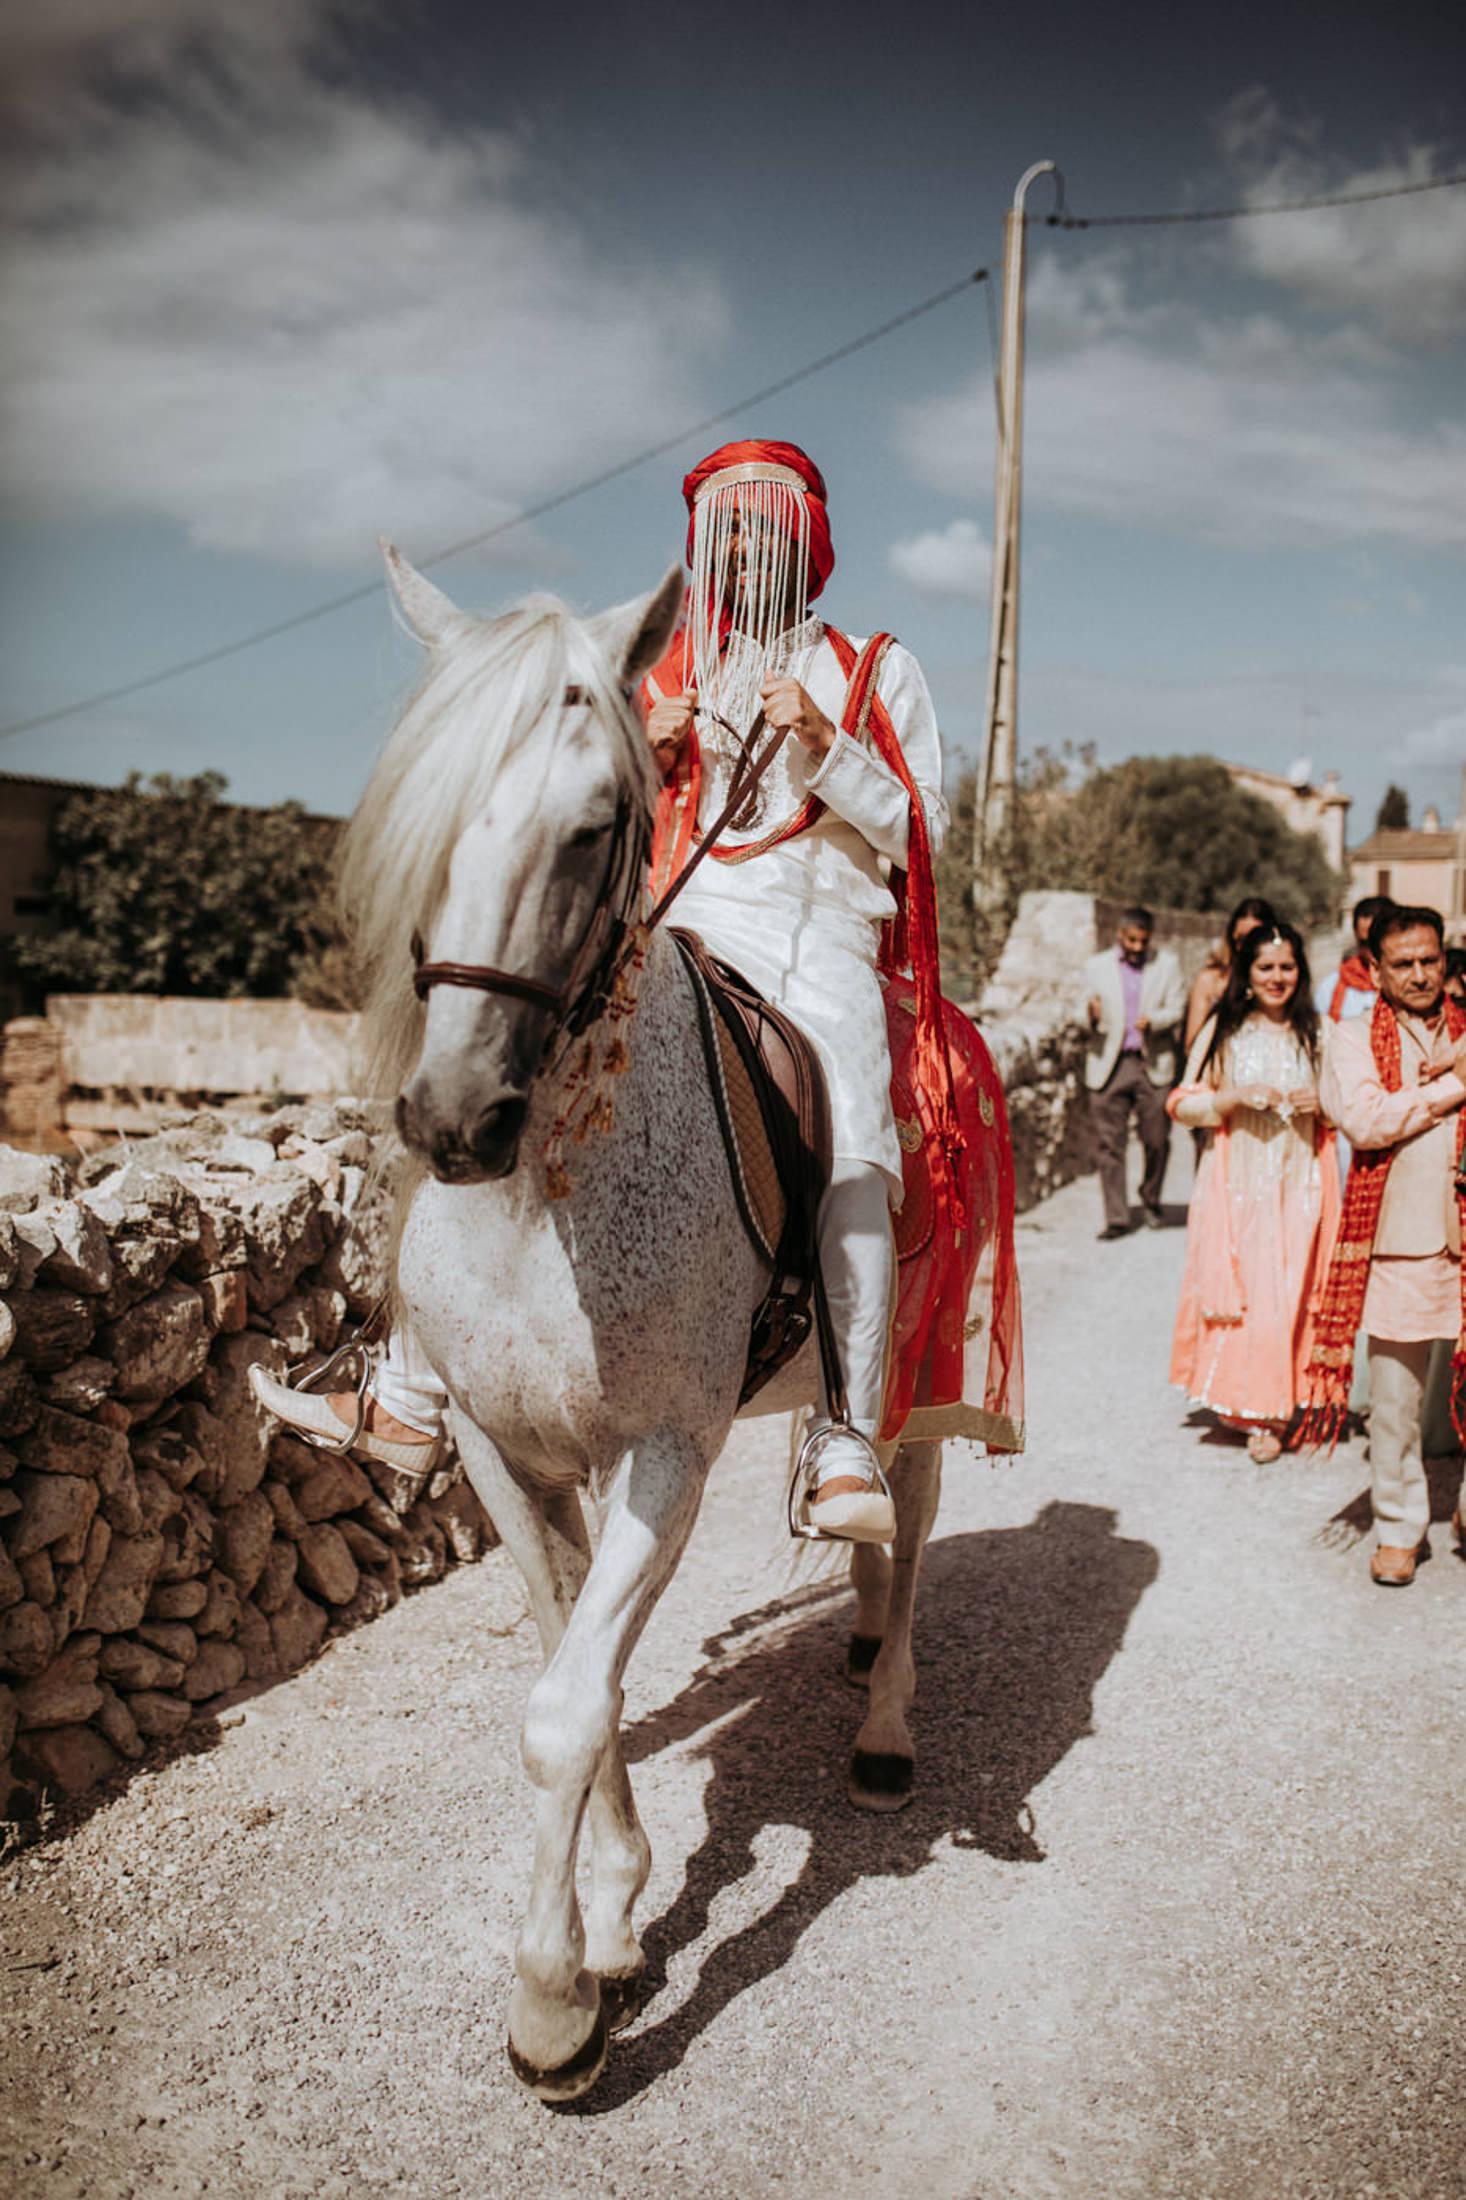 Wedding_Photographer_Mallorca_Daniela-Marquardt_Photography_New_York_Iceland_Tuscany_Santorini_Portugal_Austria_Bavaria_Elopement_Hochzeitsfotograf_AntjeRajat2_28